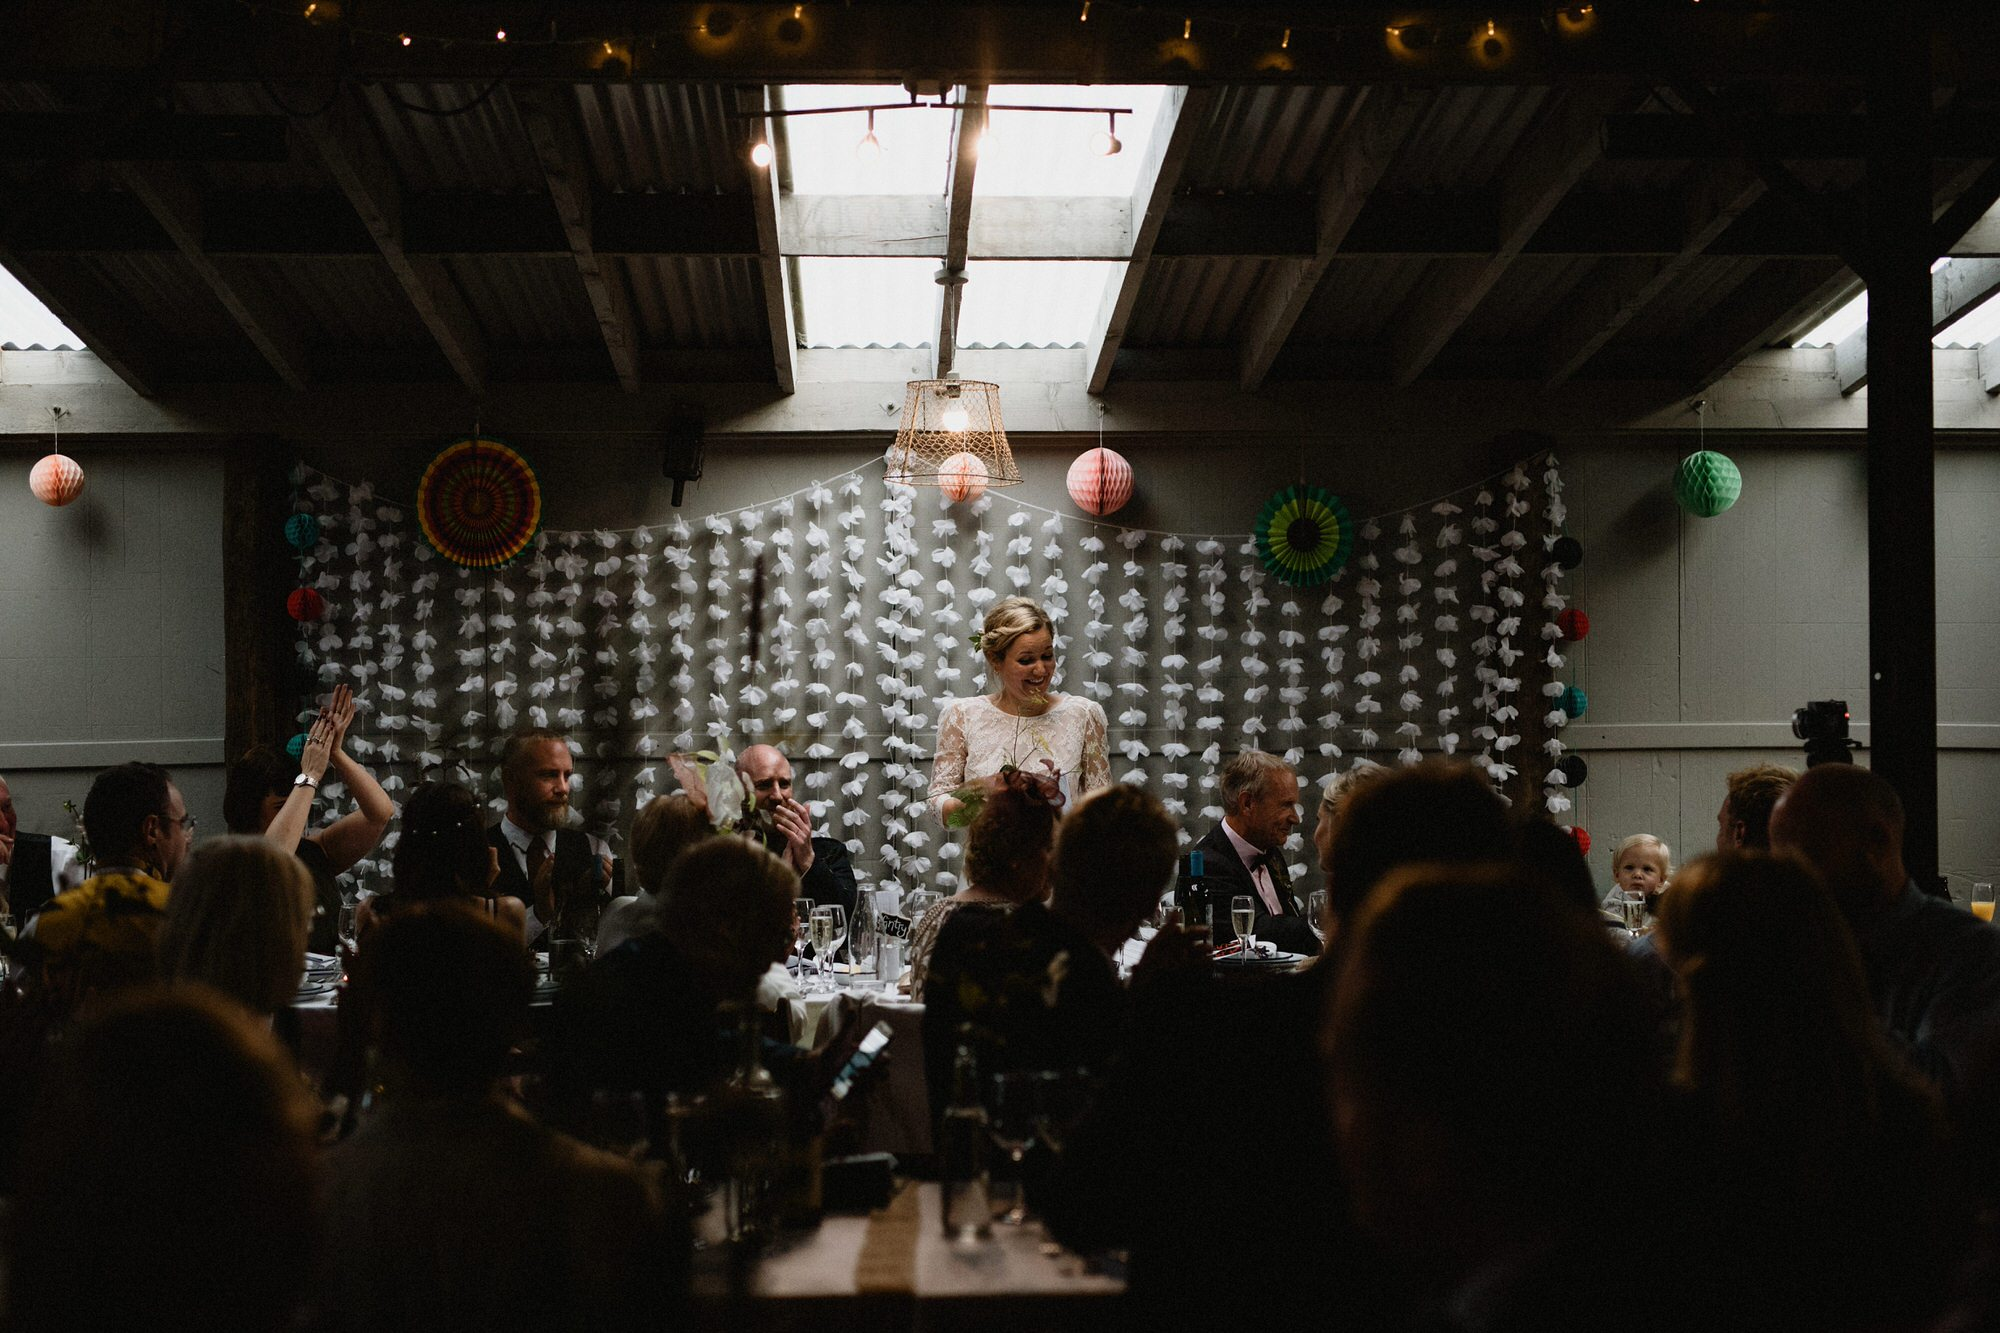 051 TIN SHED KNOCKRAICH WEDDING AUTUMN ZOE ALEXANDRA PHOTOGRAPHY